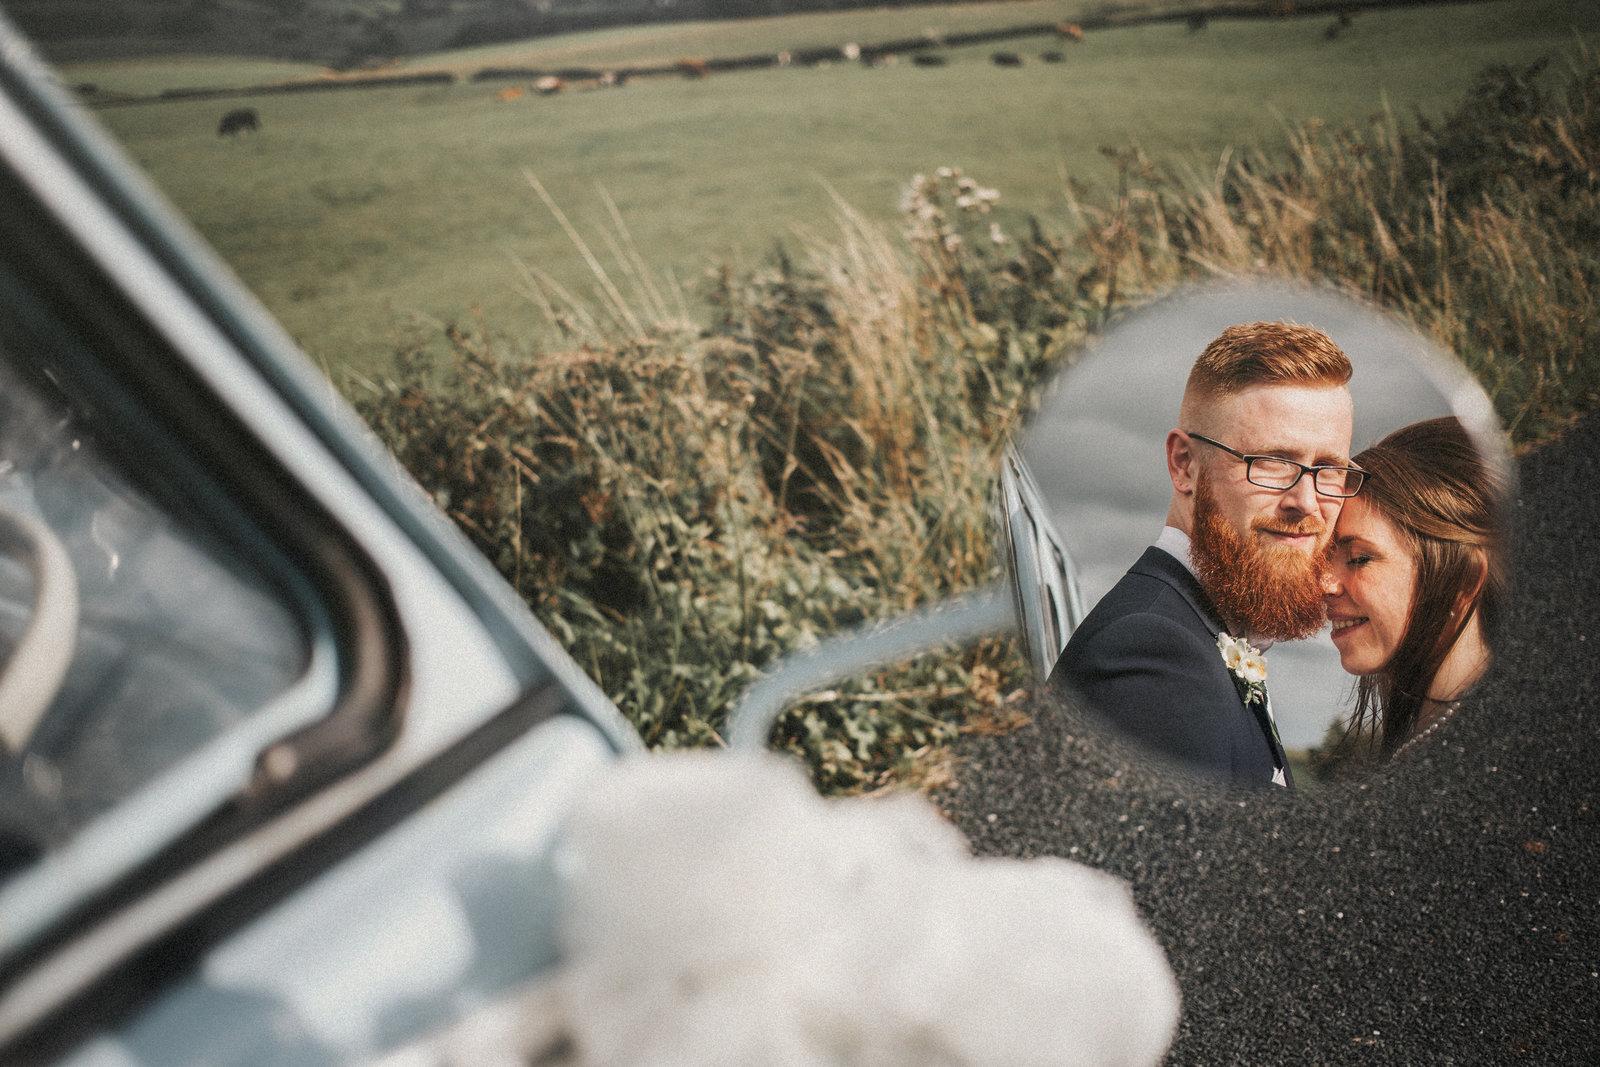 Lancashire Wedding Photographer - Jono Symonds Photography 155-1